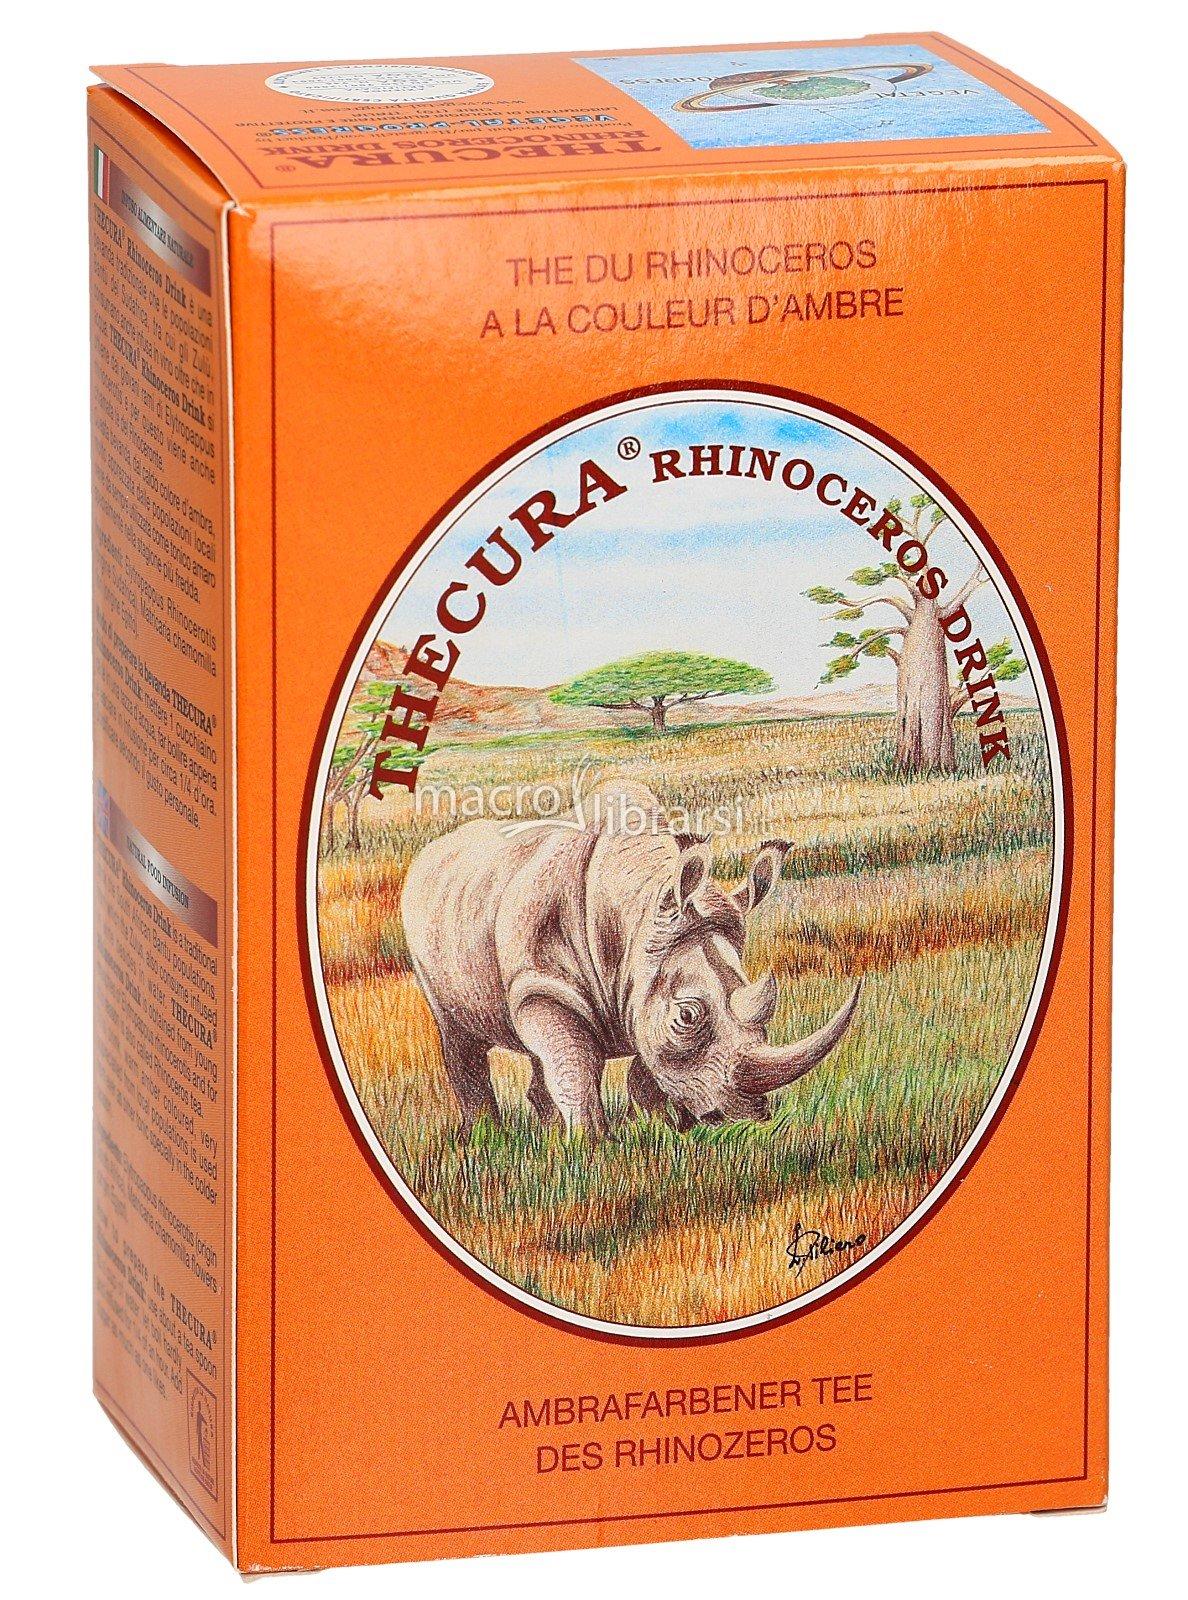 Centro Zohar - Bevanda Tradizonale Sudafricana - Thecura Rhinoceros Drink